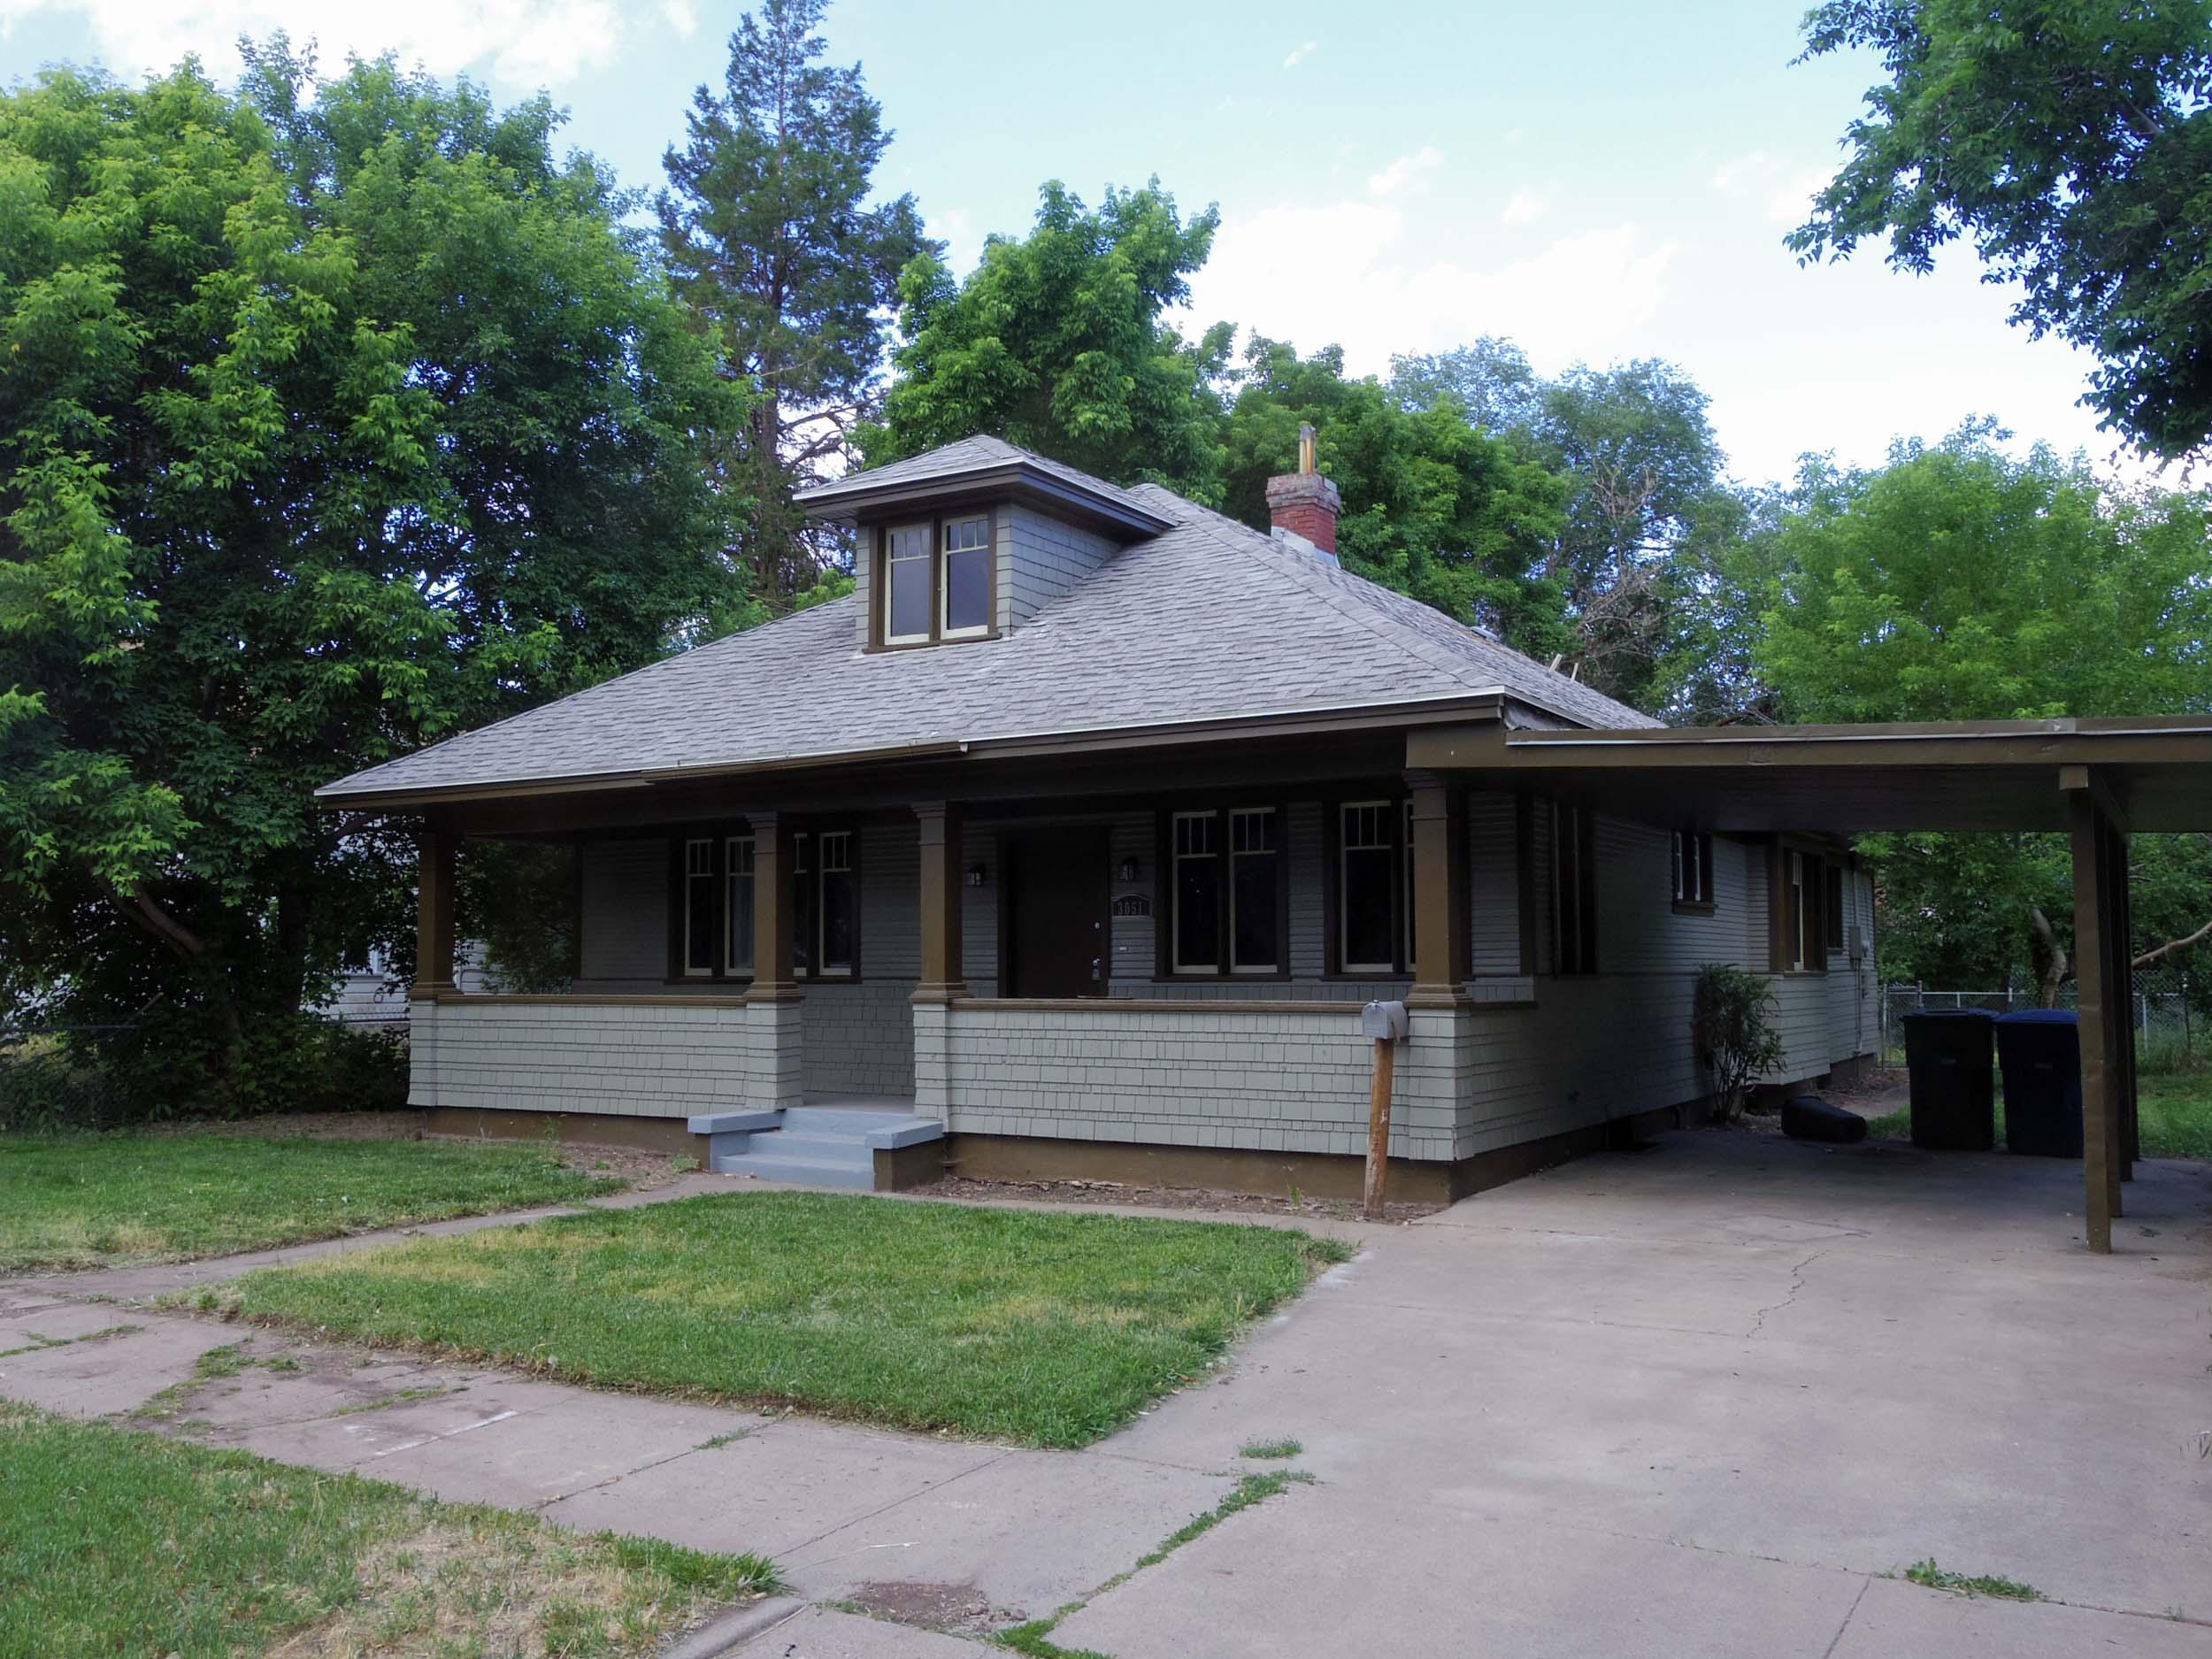 FOR SALE:  Classic Craftsman Era Home